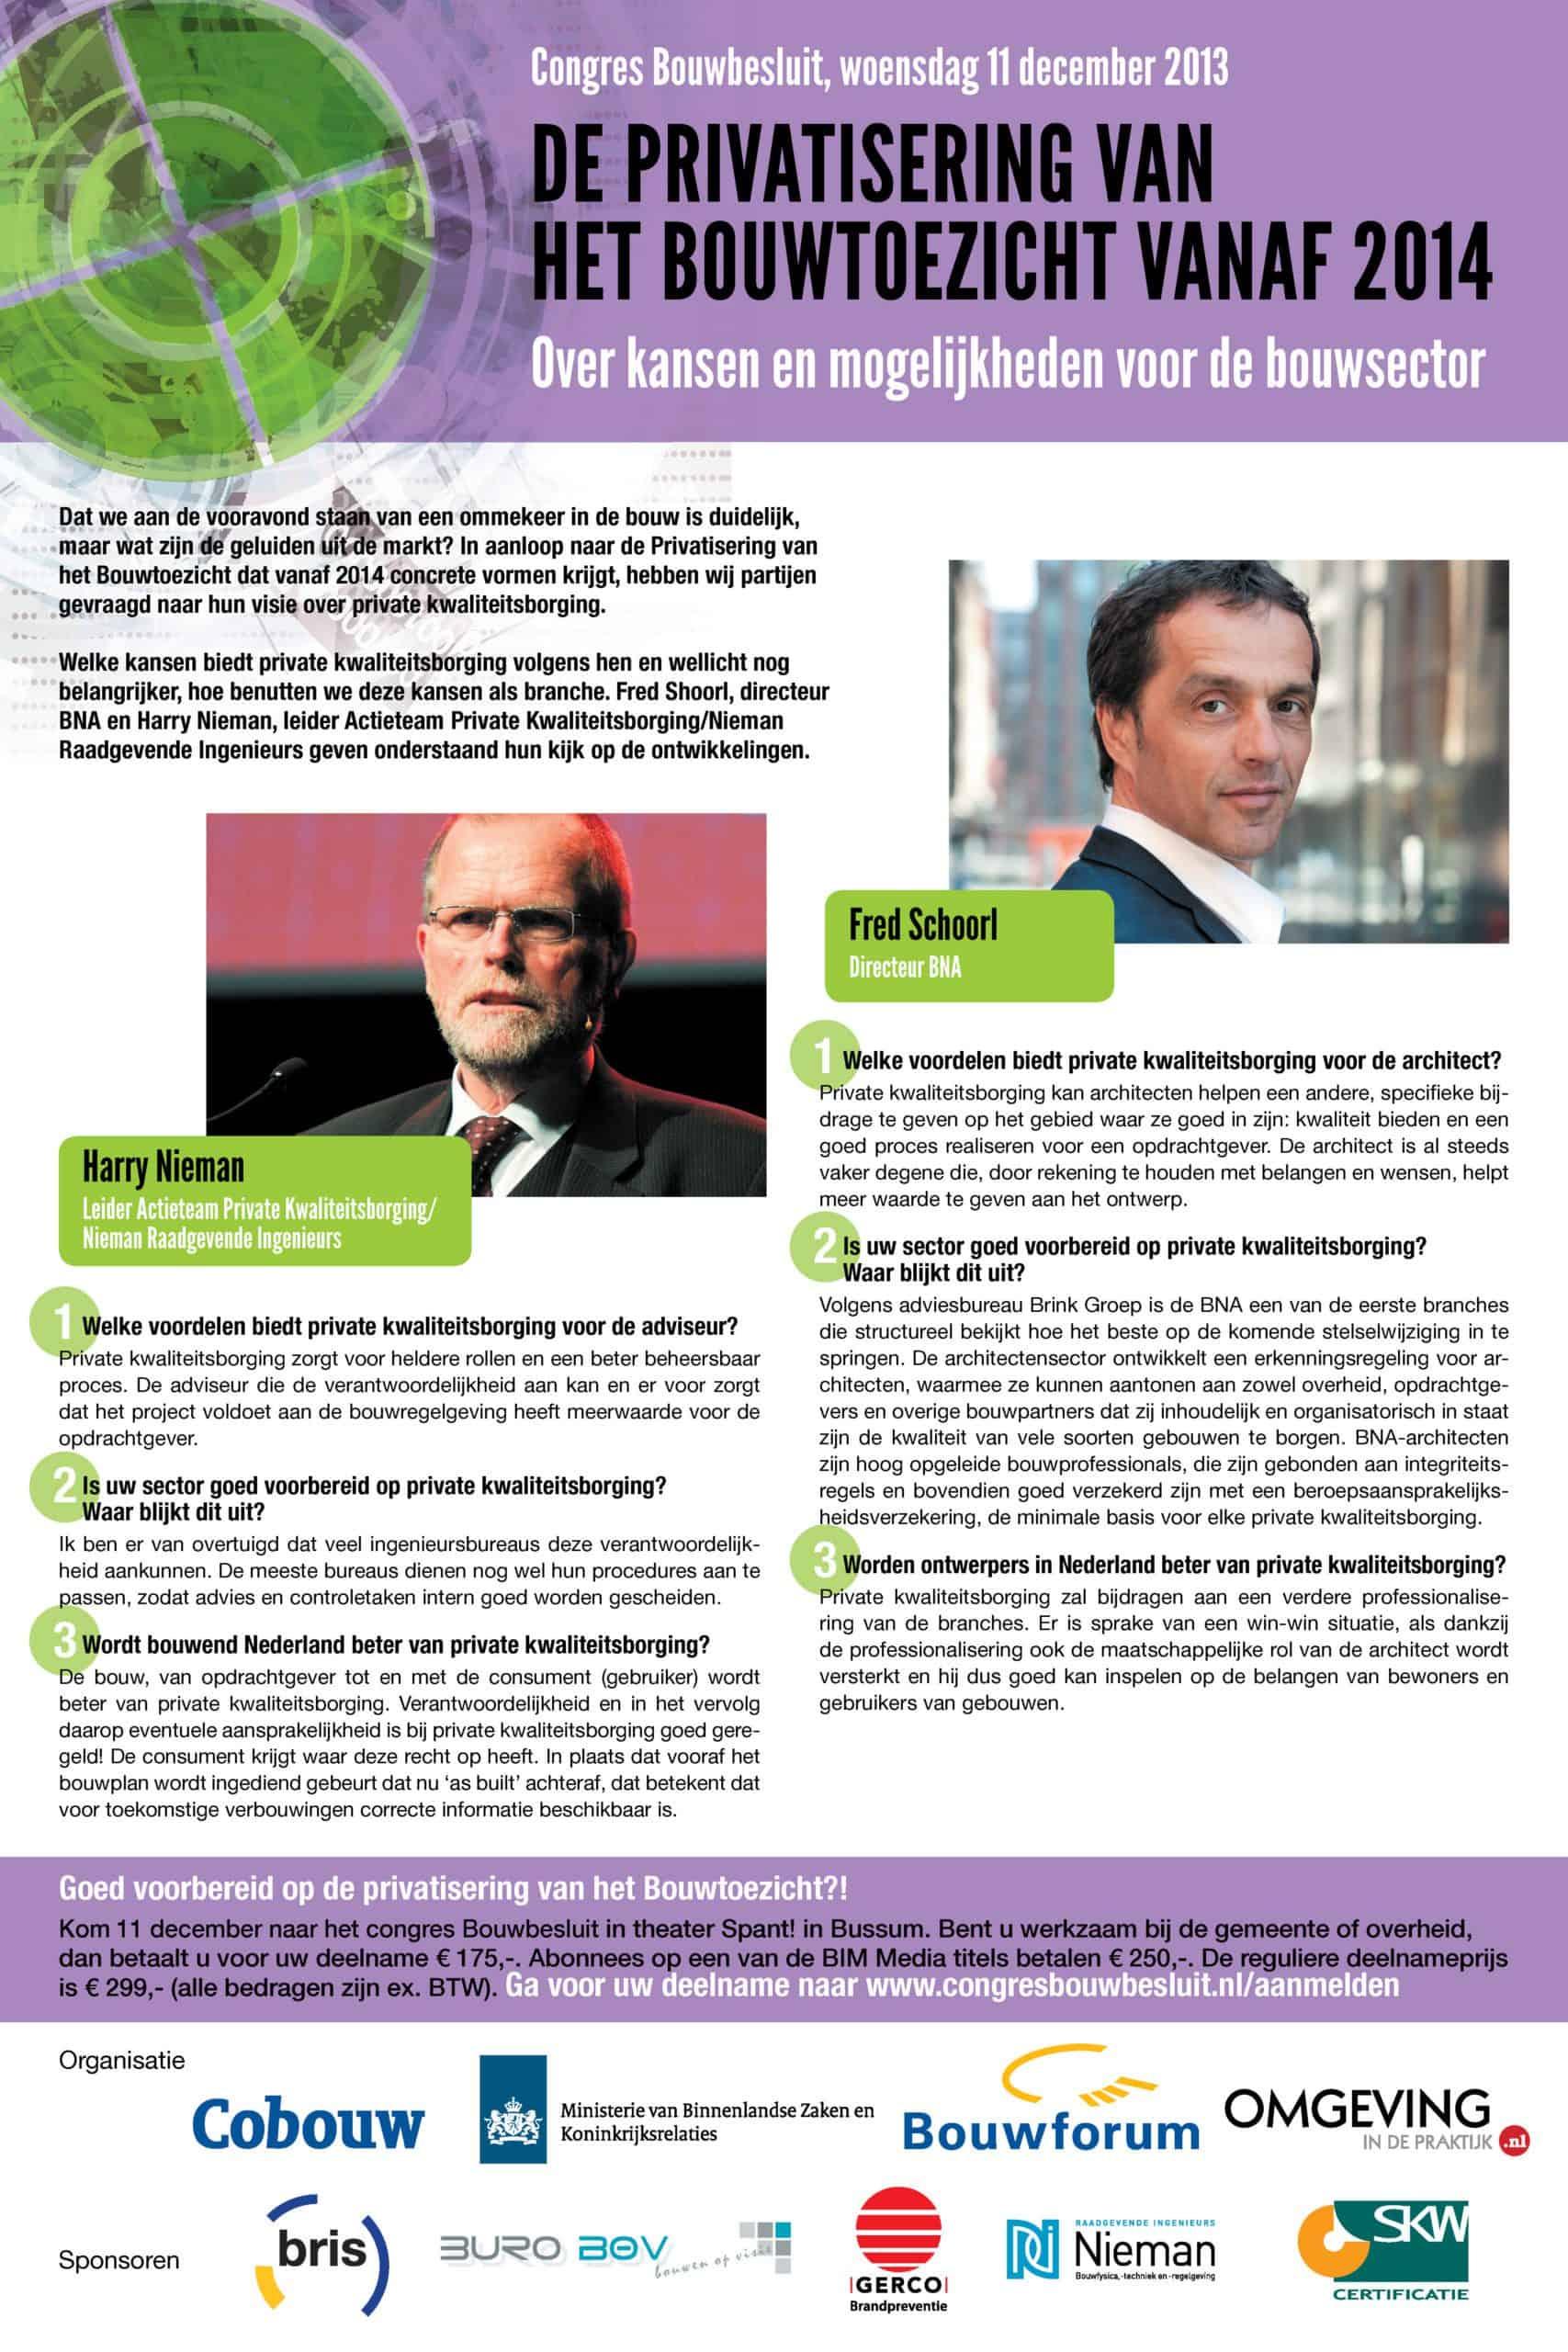 Cobouw-Congres-Bouwbesluit-2013-1-scaled